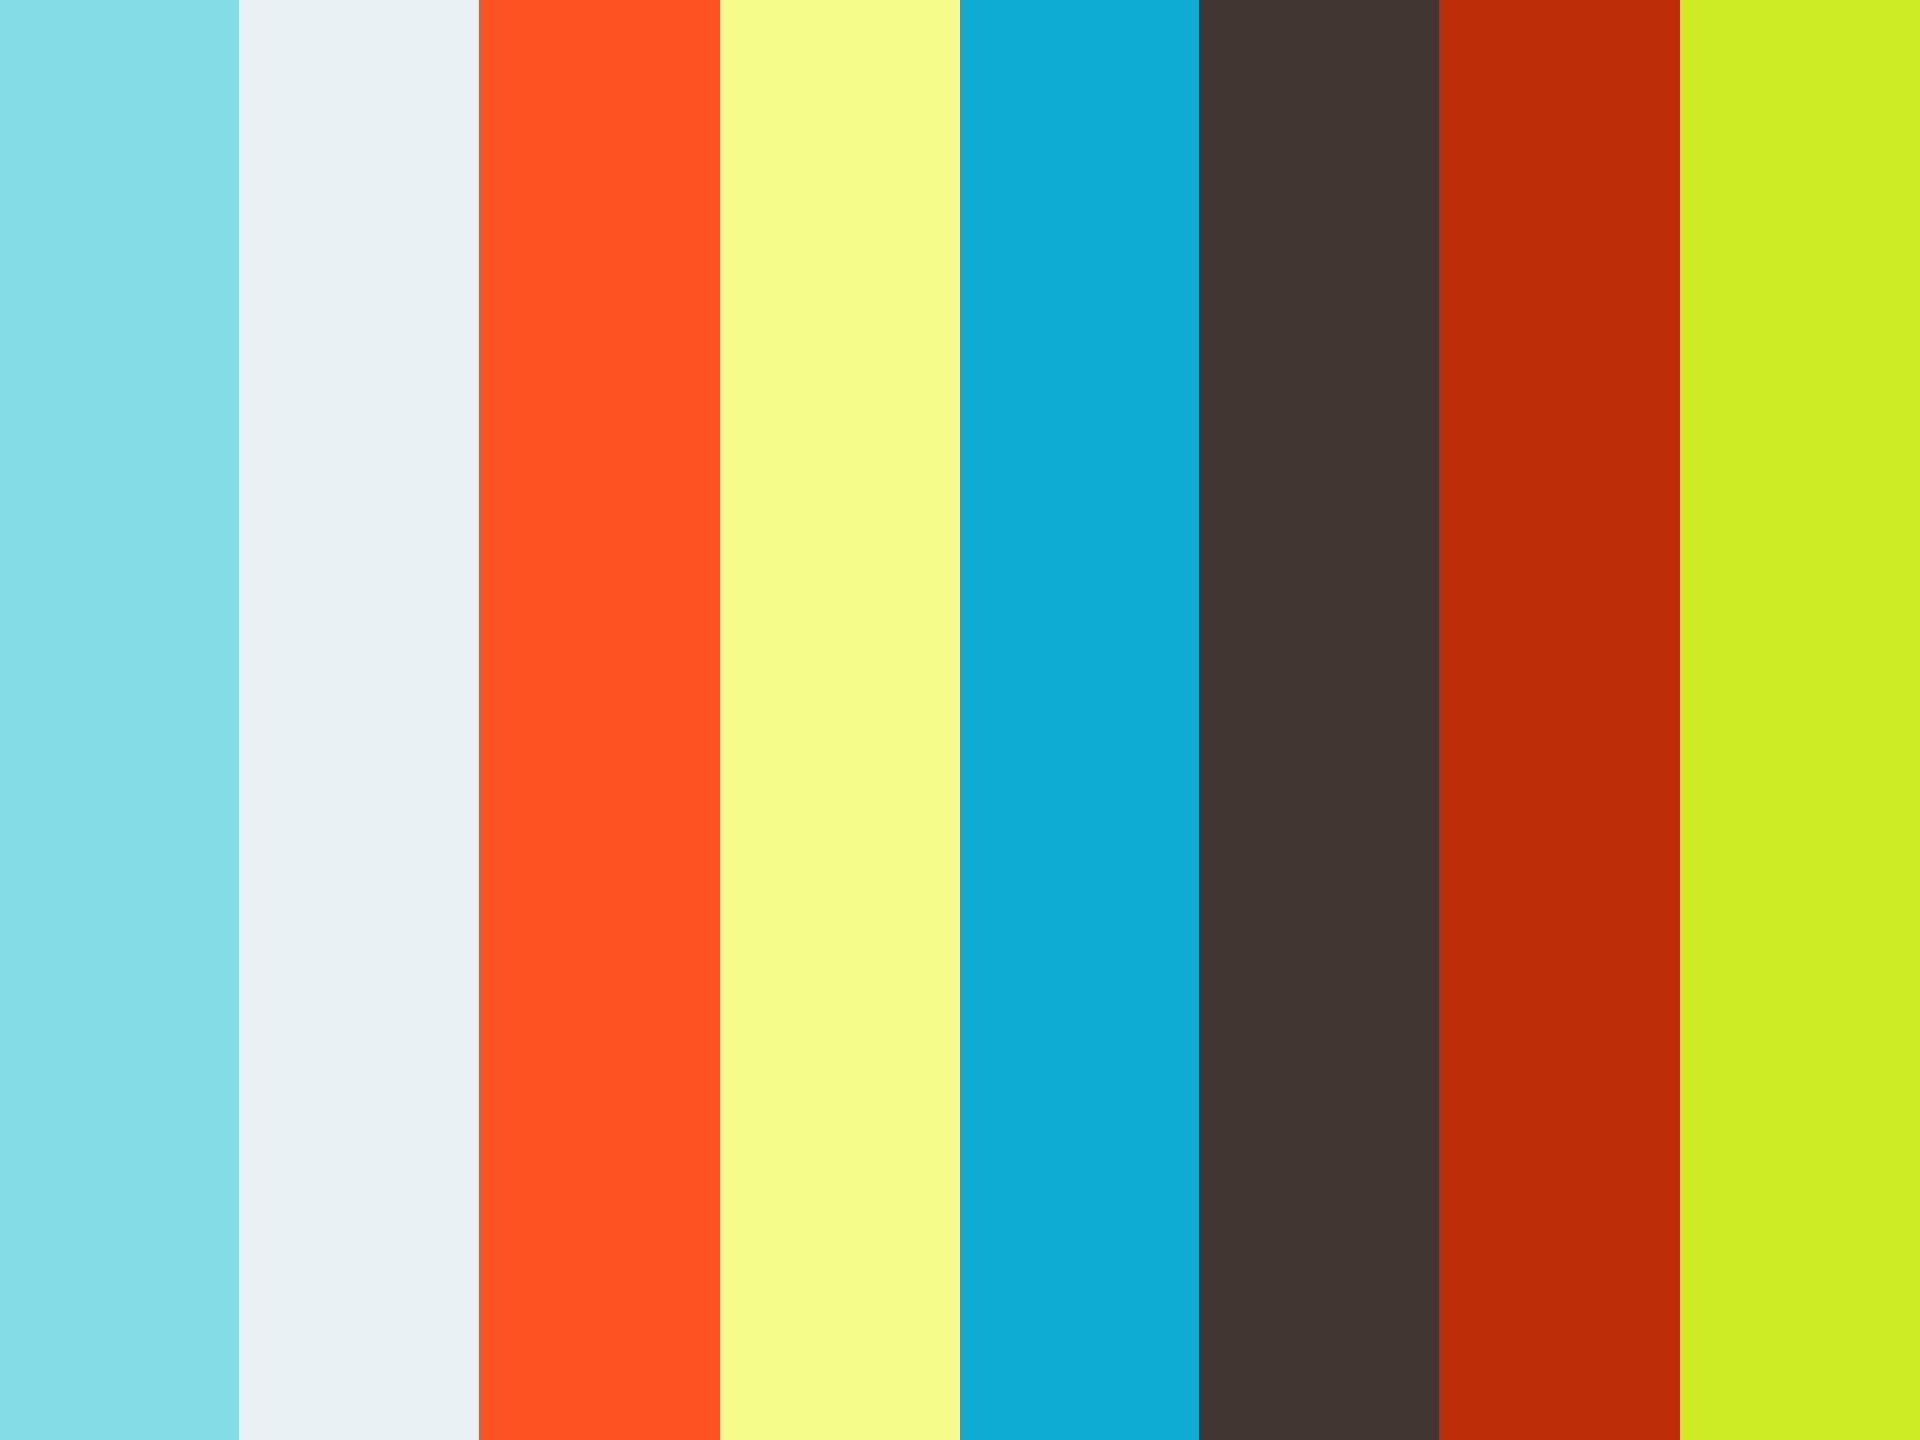 3d Live Wallpaper App Strt Loop On Vimeo